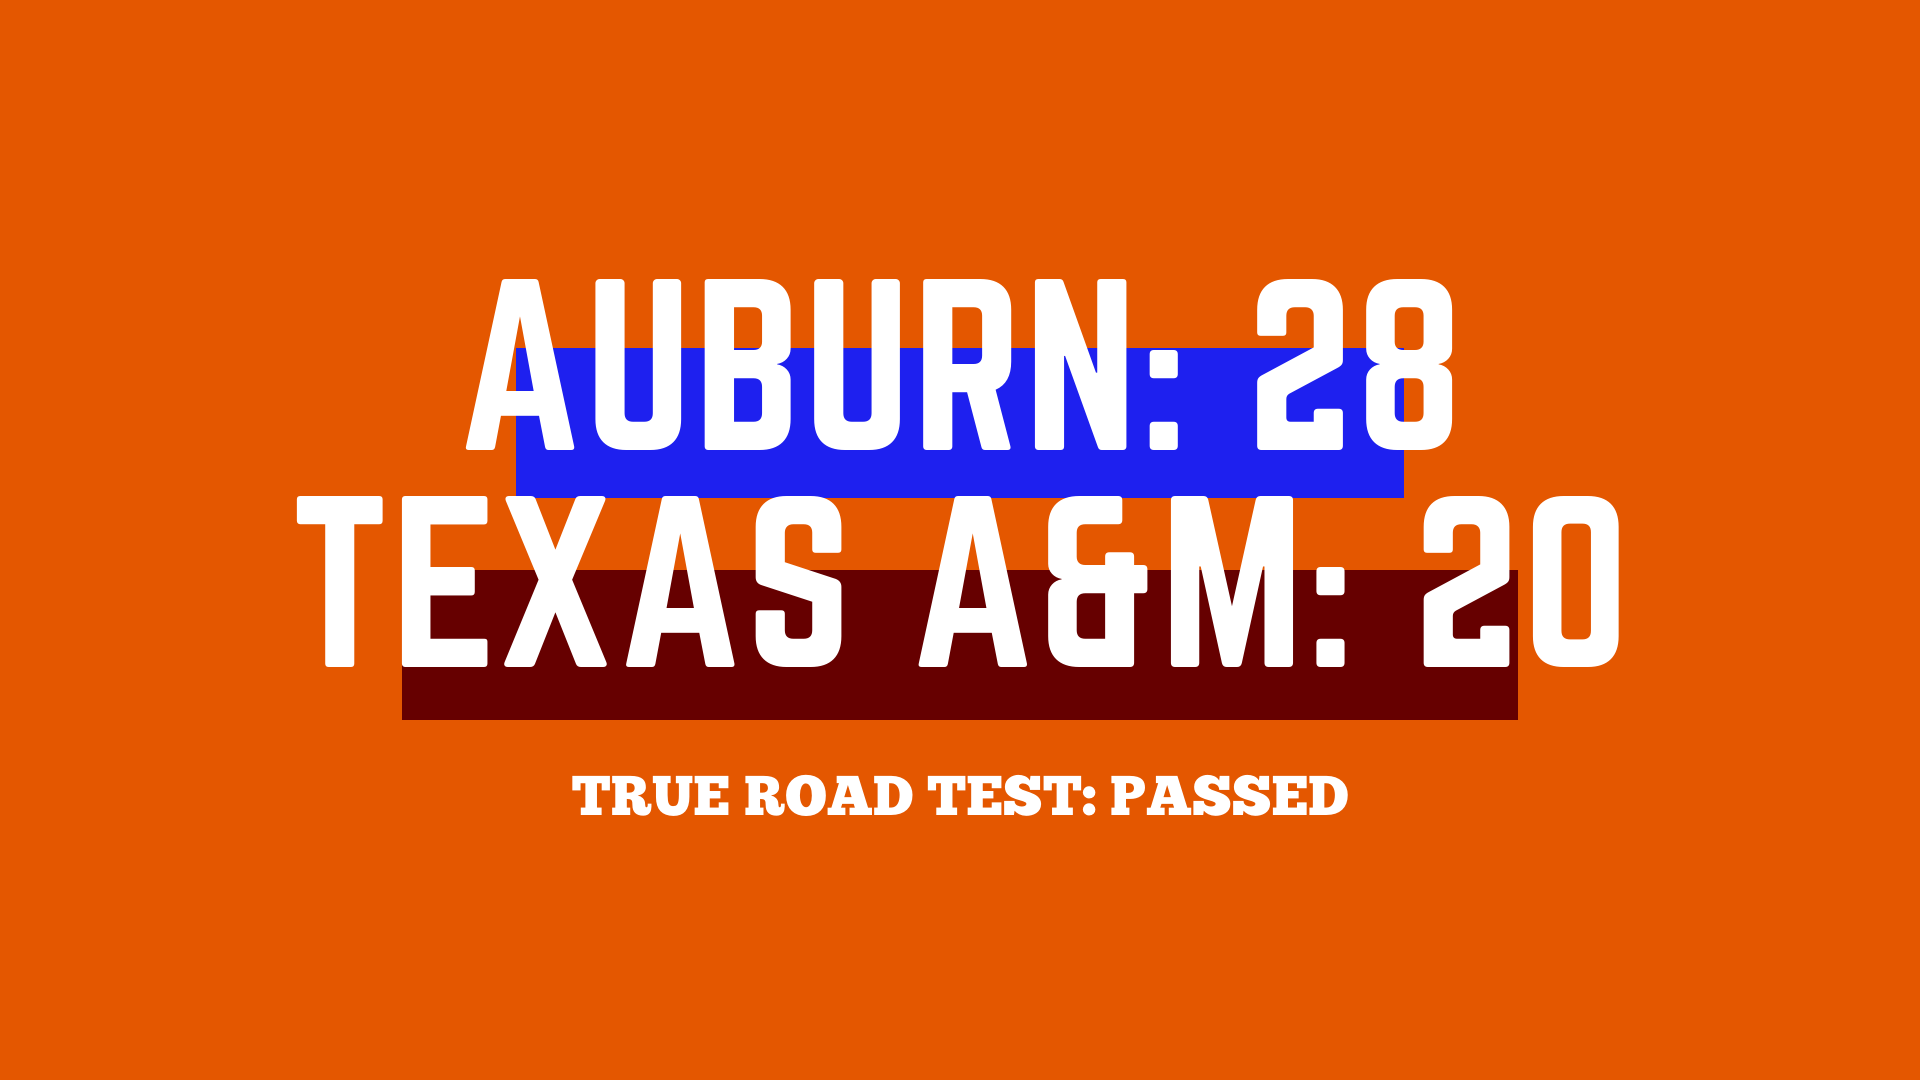 Auburn Recap Template (2)